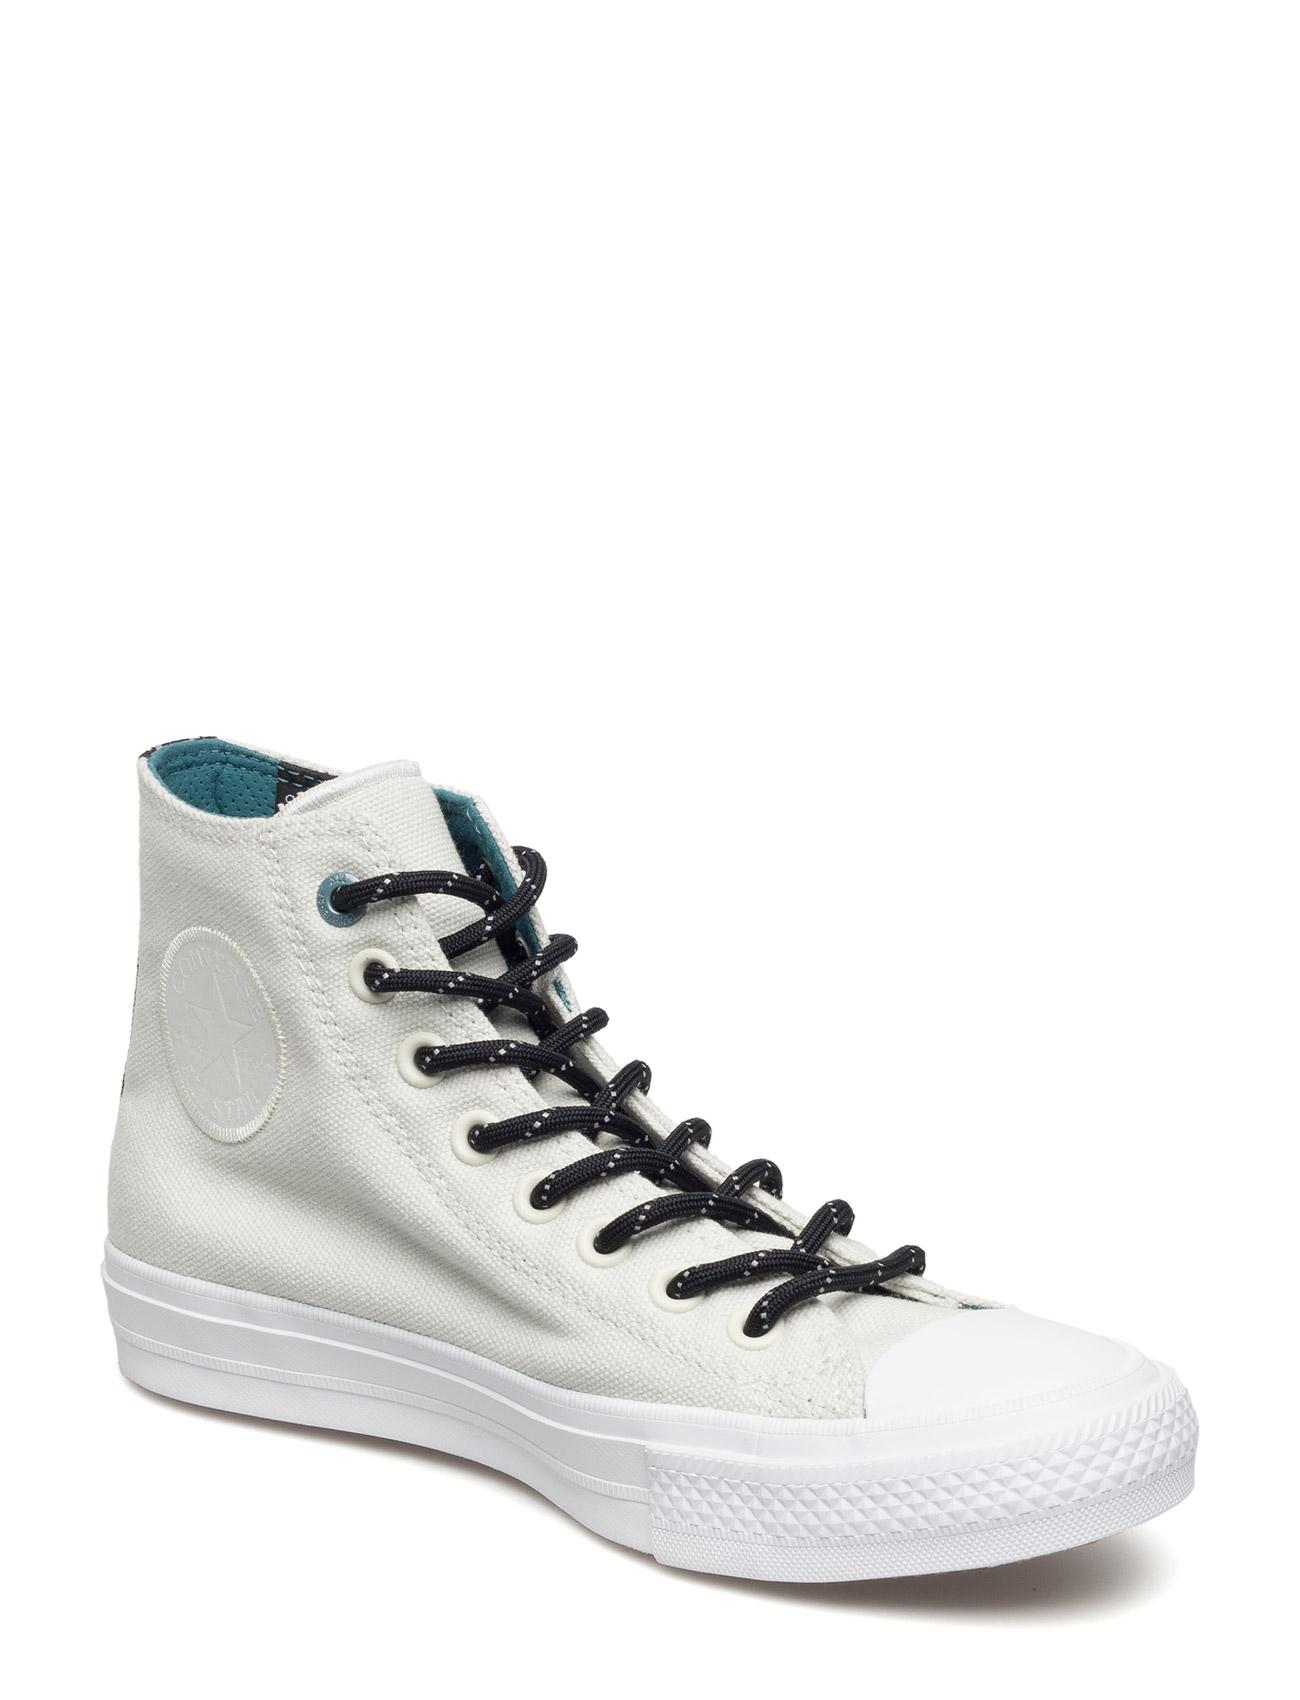 Ctas Ii Shield Hi Converse Sneakers til Damer i